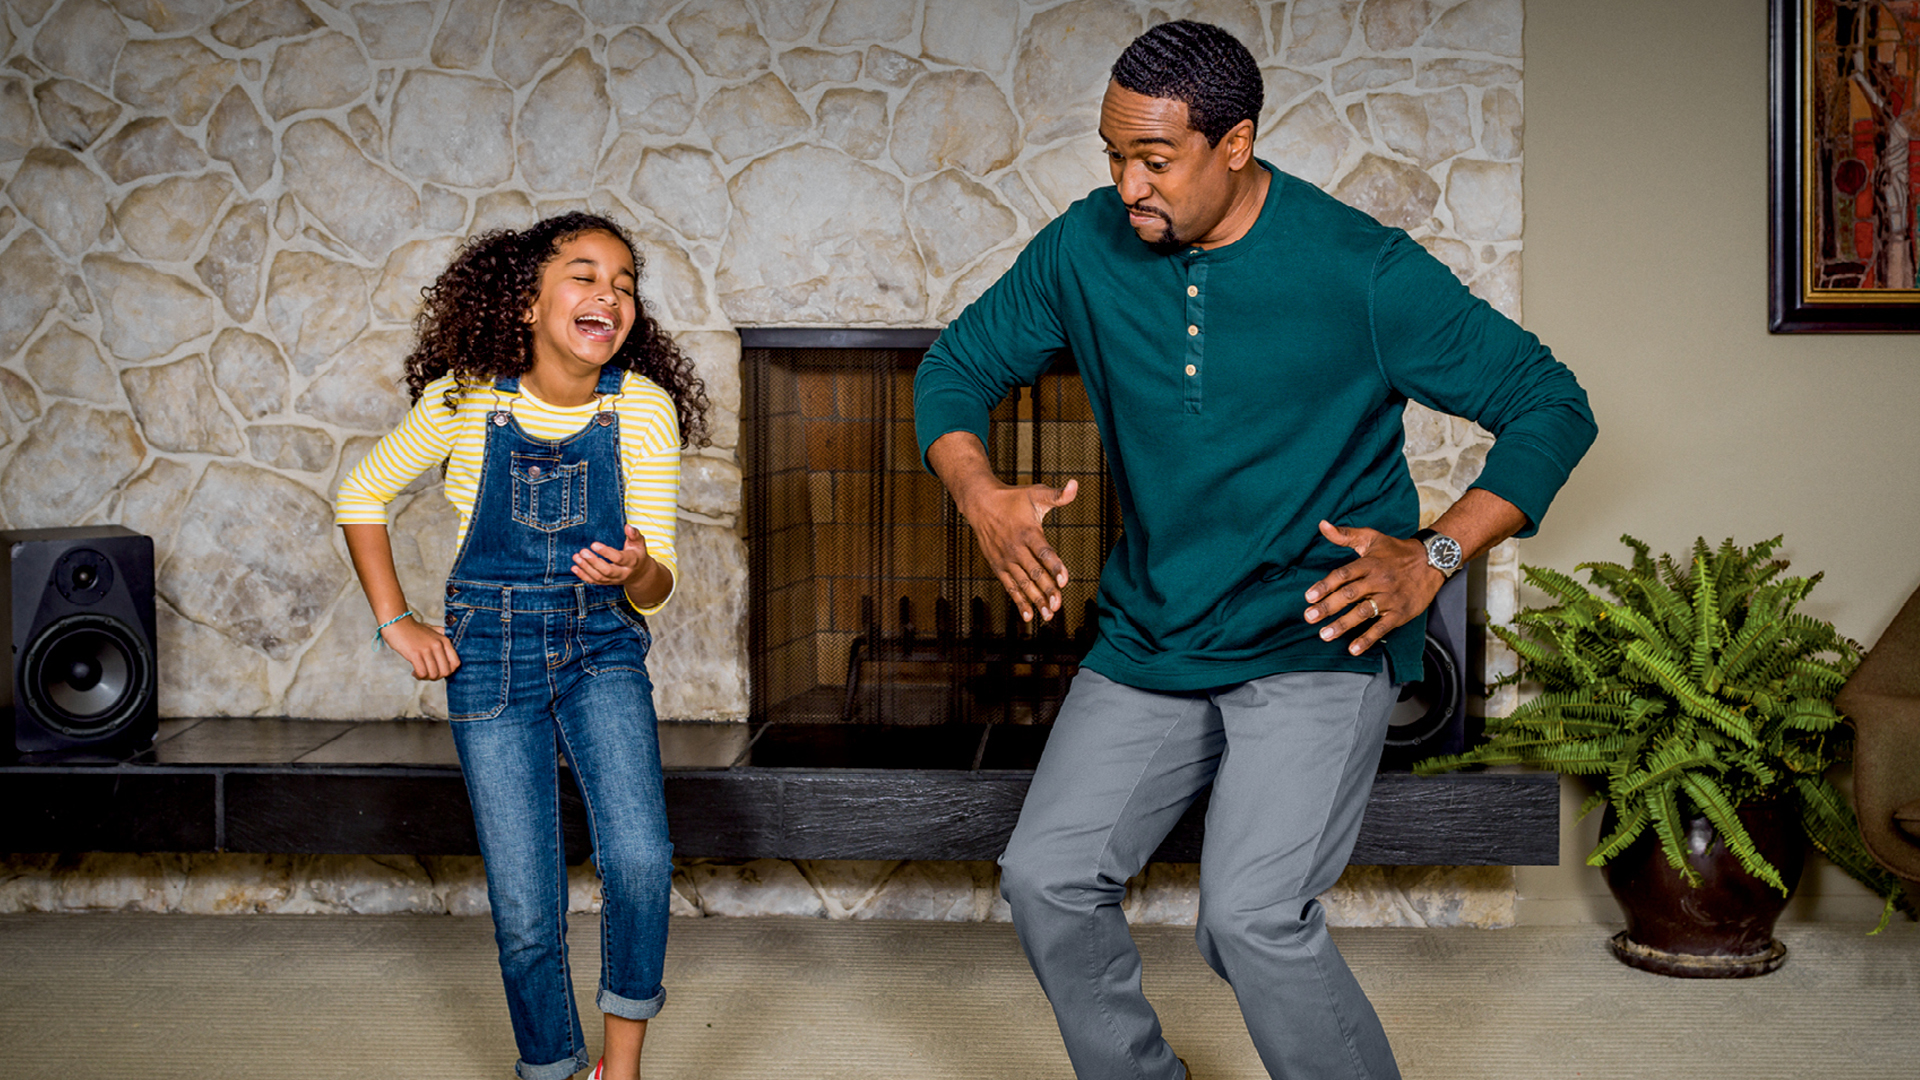 Fatherhood Involvement